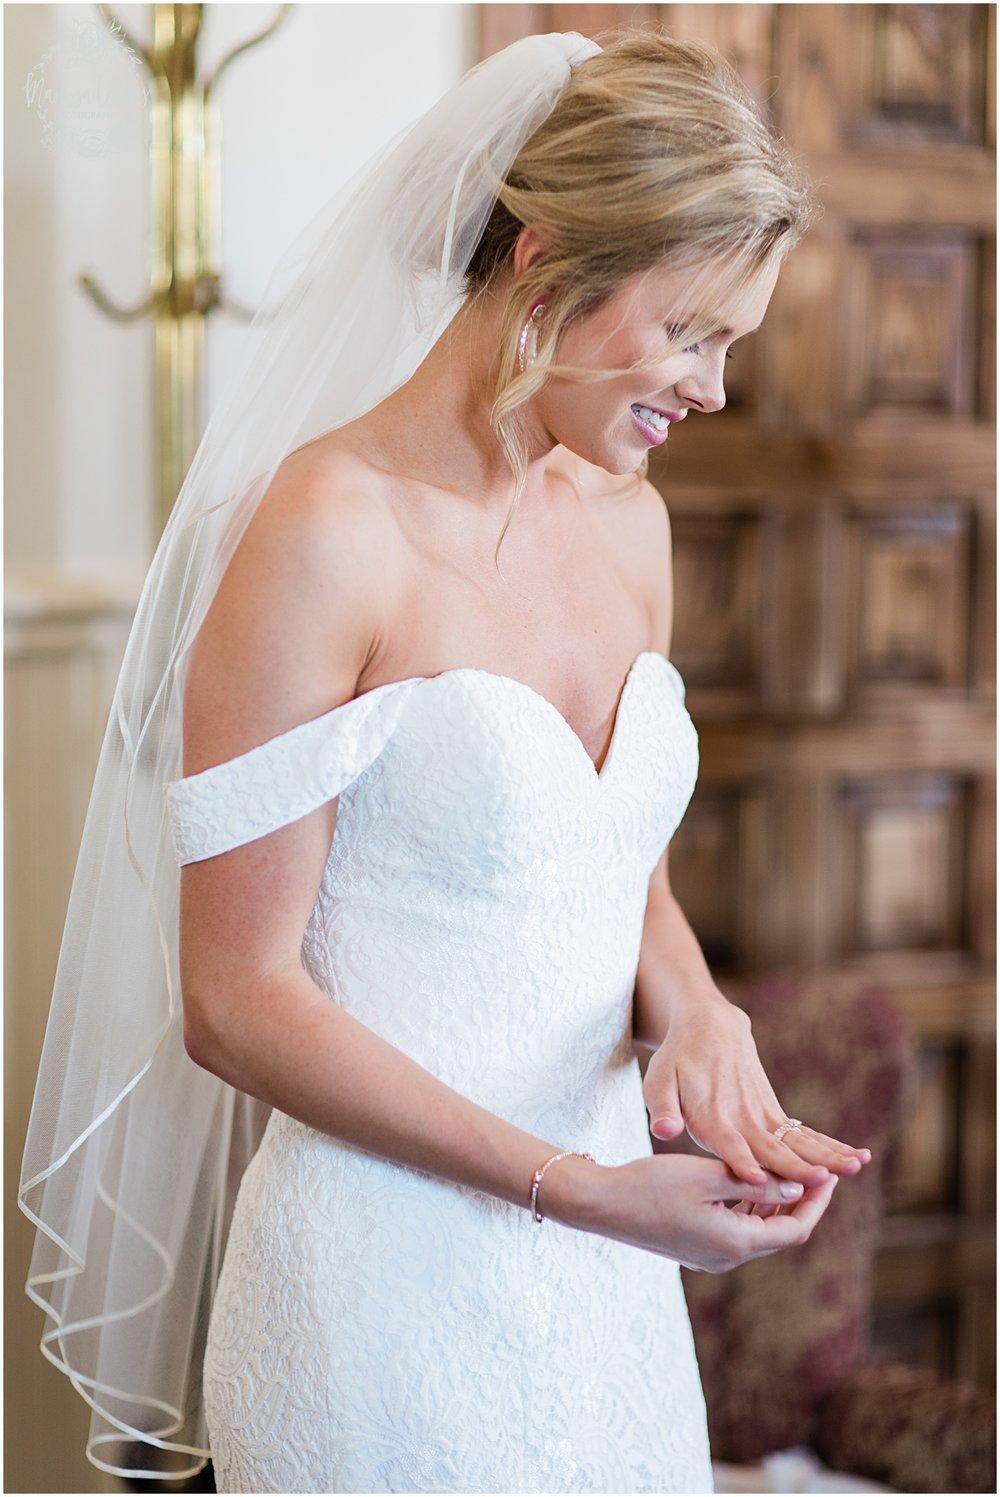 RHODES WEDDING | WESTON RED BARN FARM | MARISSA CRIBBS PHOTOGRAPHY_5222.jpg